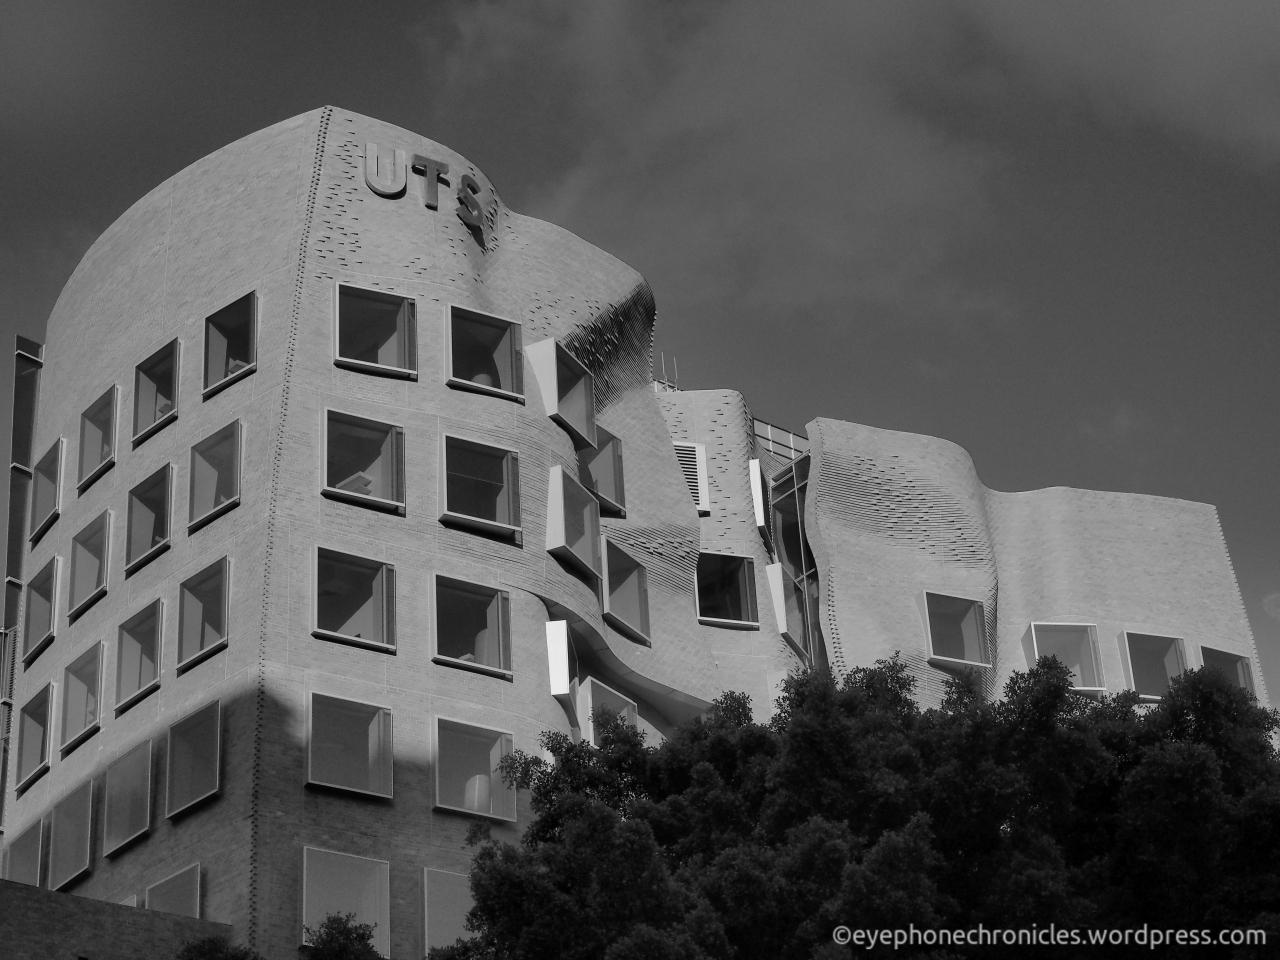 UTS-Chau Chak Wing building (3)